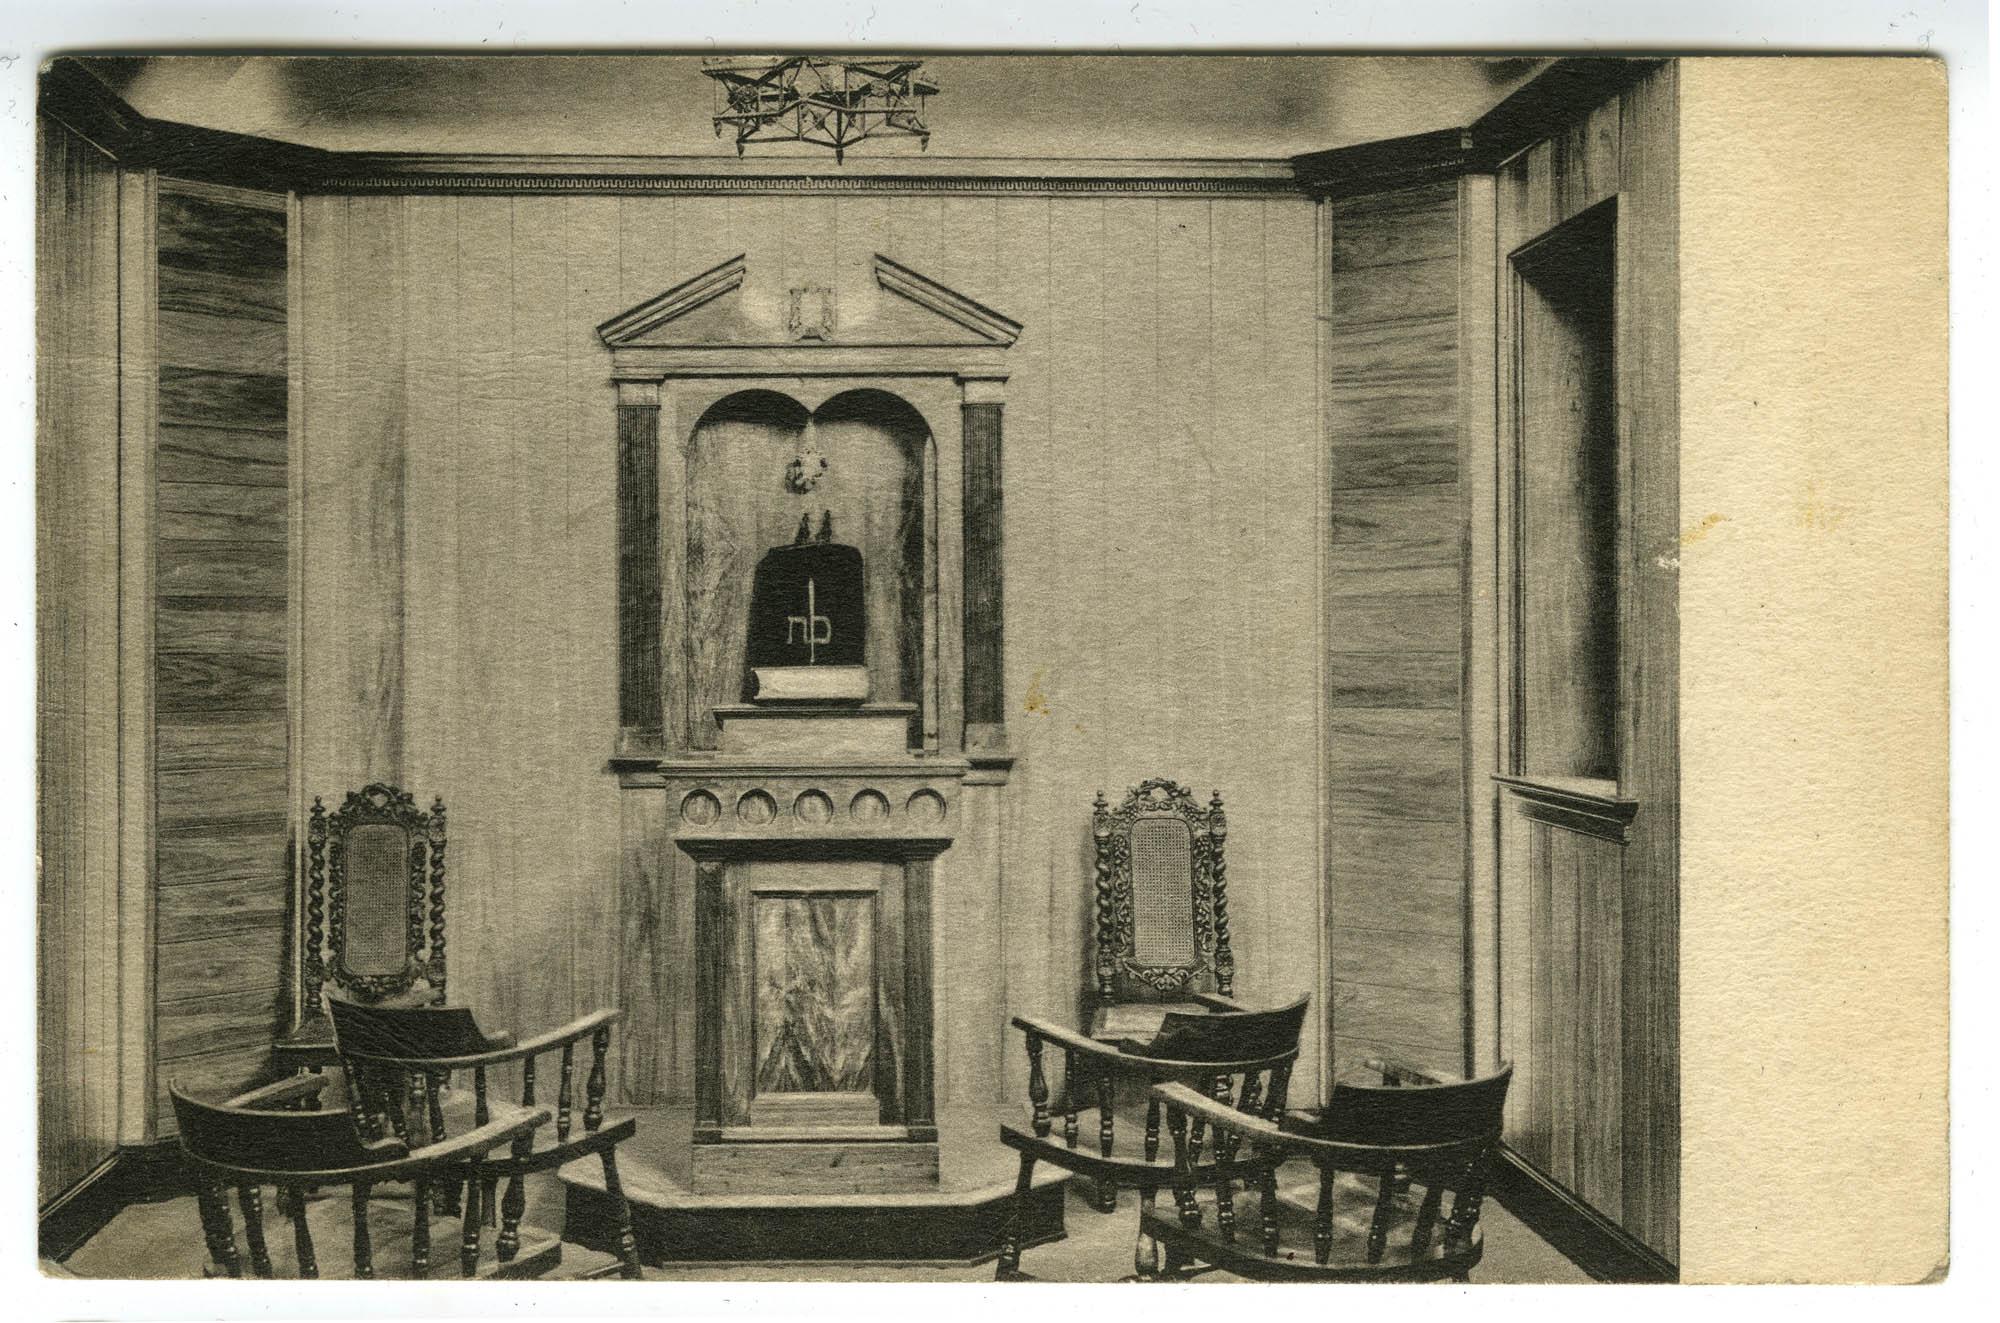 The Little Chapel. Gift of the Sisterhood of the Washington Hebrew Congregation, Jan. 1937